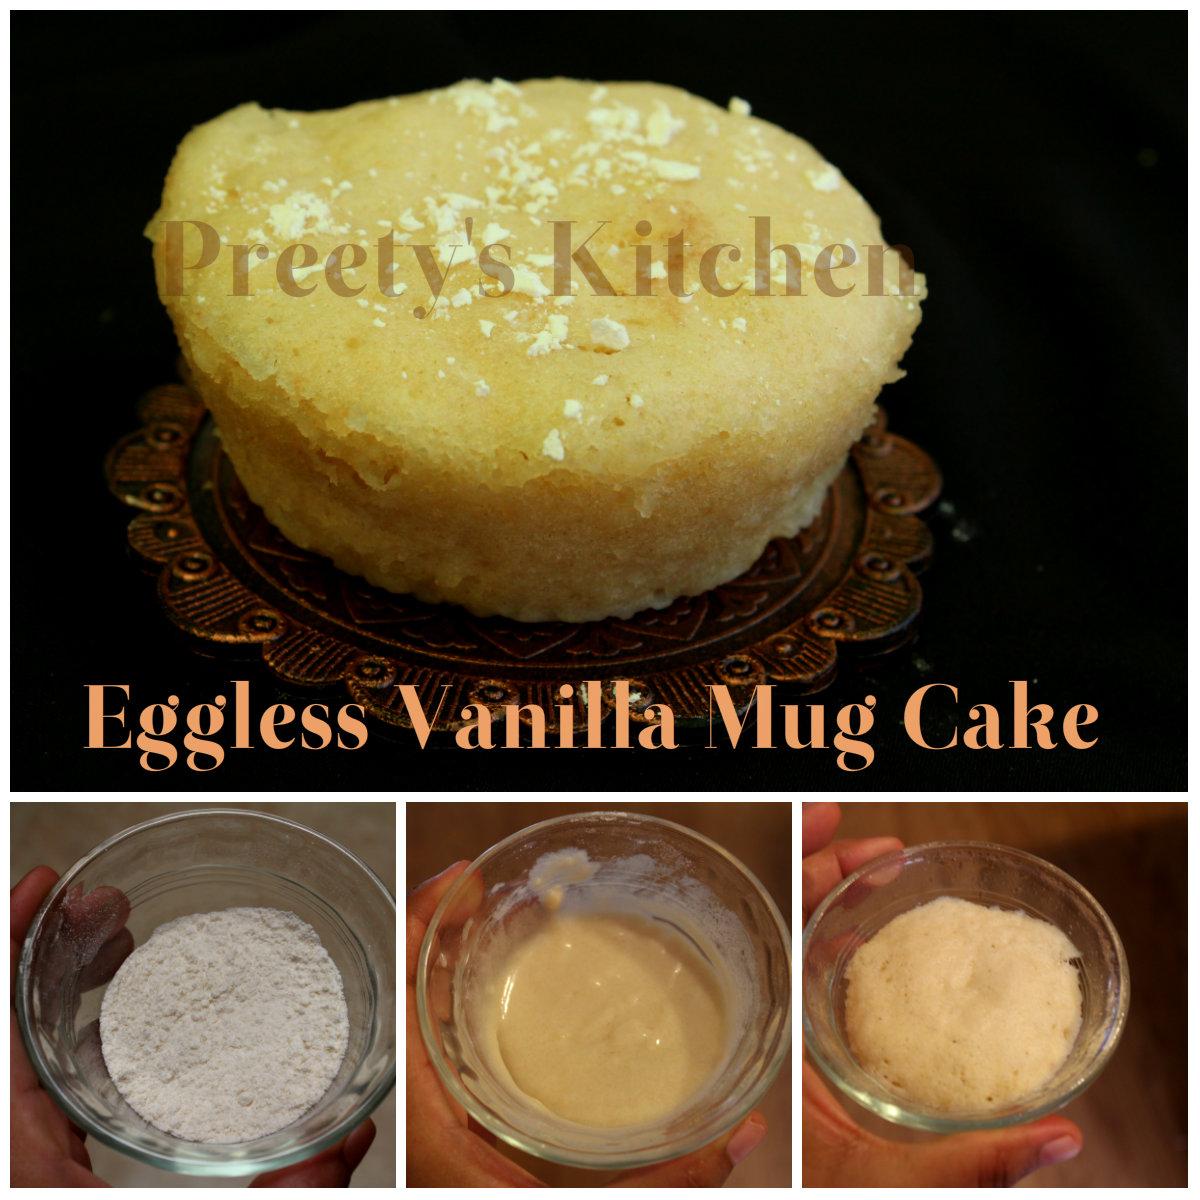 Preety's Kitchen: Eggless Vanilla Mug Cake / Single ...